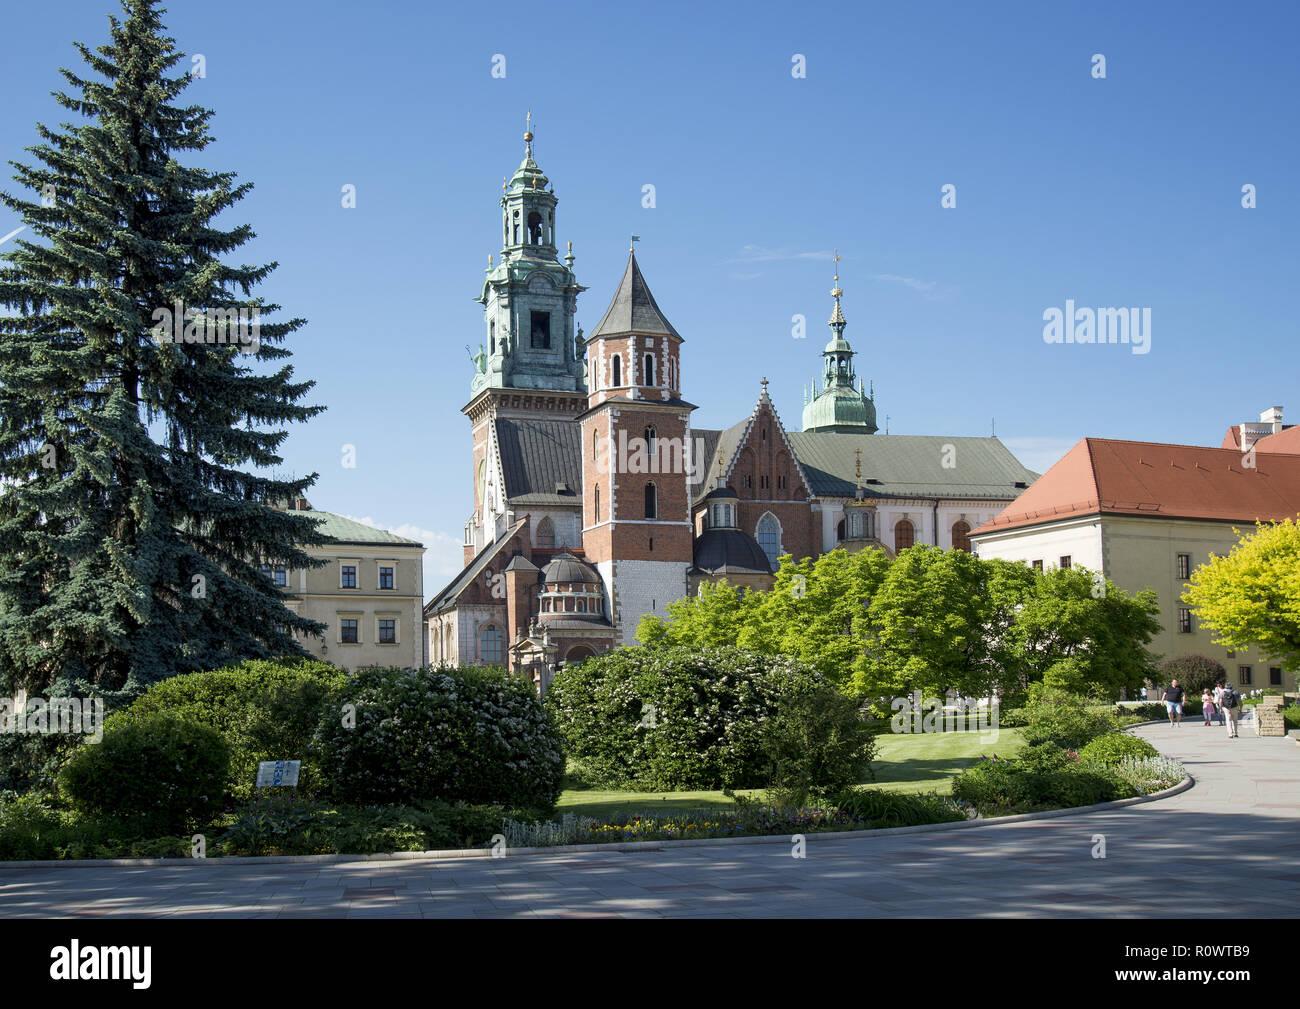 Krakau, Burghof Wawel, Polen - Stock Image